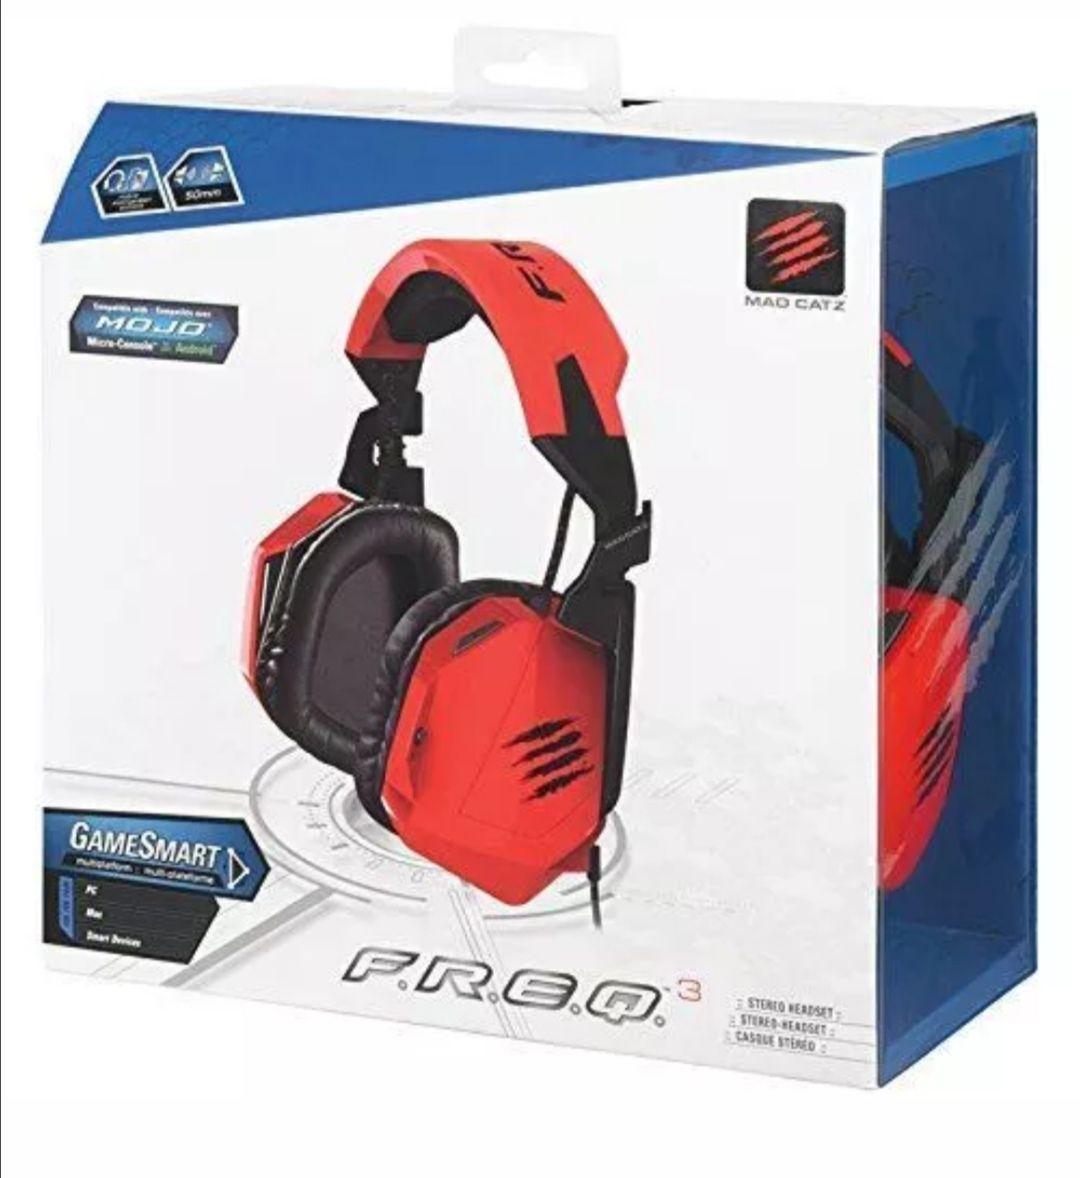 Mad Catz F.R.E.Q.3 3.5mm Stereo Headset Red PC Brand New Sealed £8.02 @ G2gltd Ebay